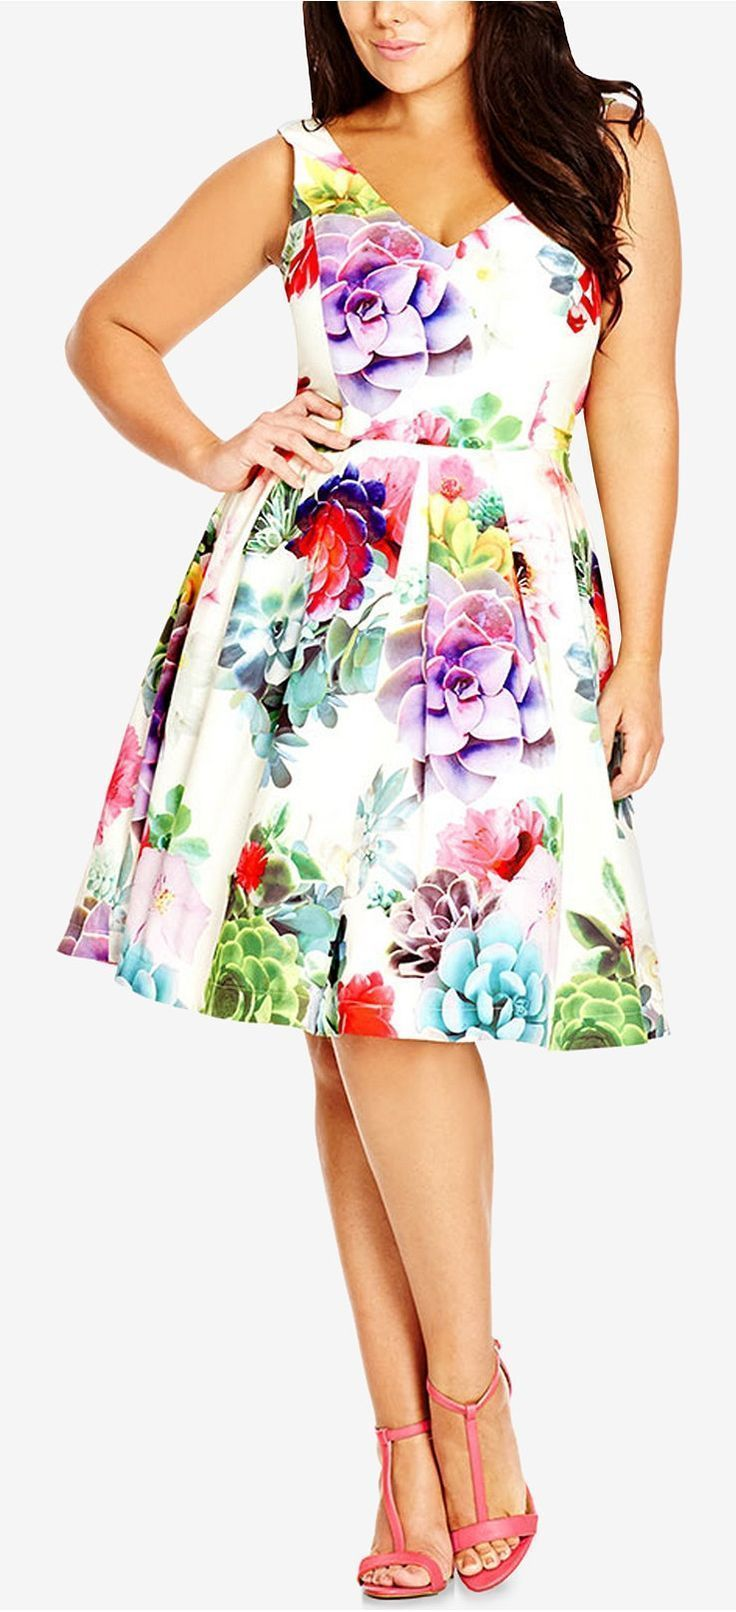 Plus Size Sleeveless Empire Waist Dress Plus Size Fashion